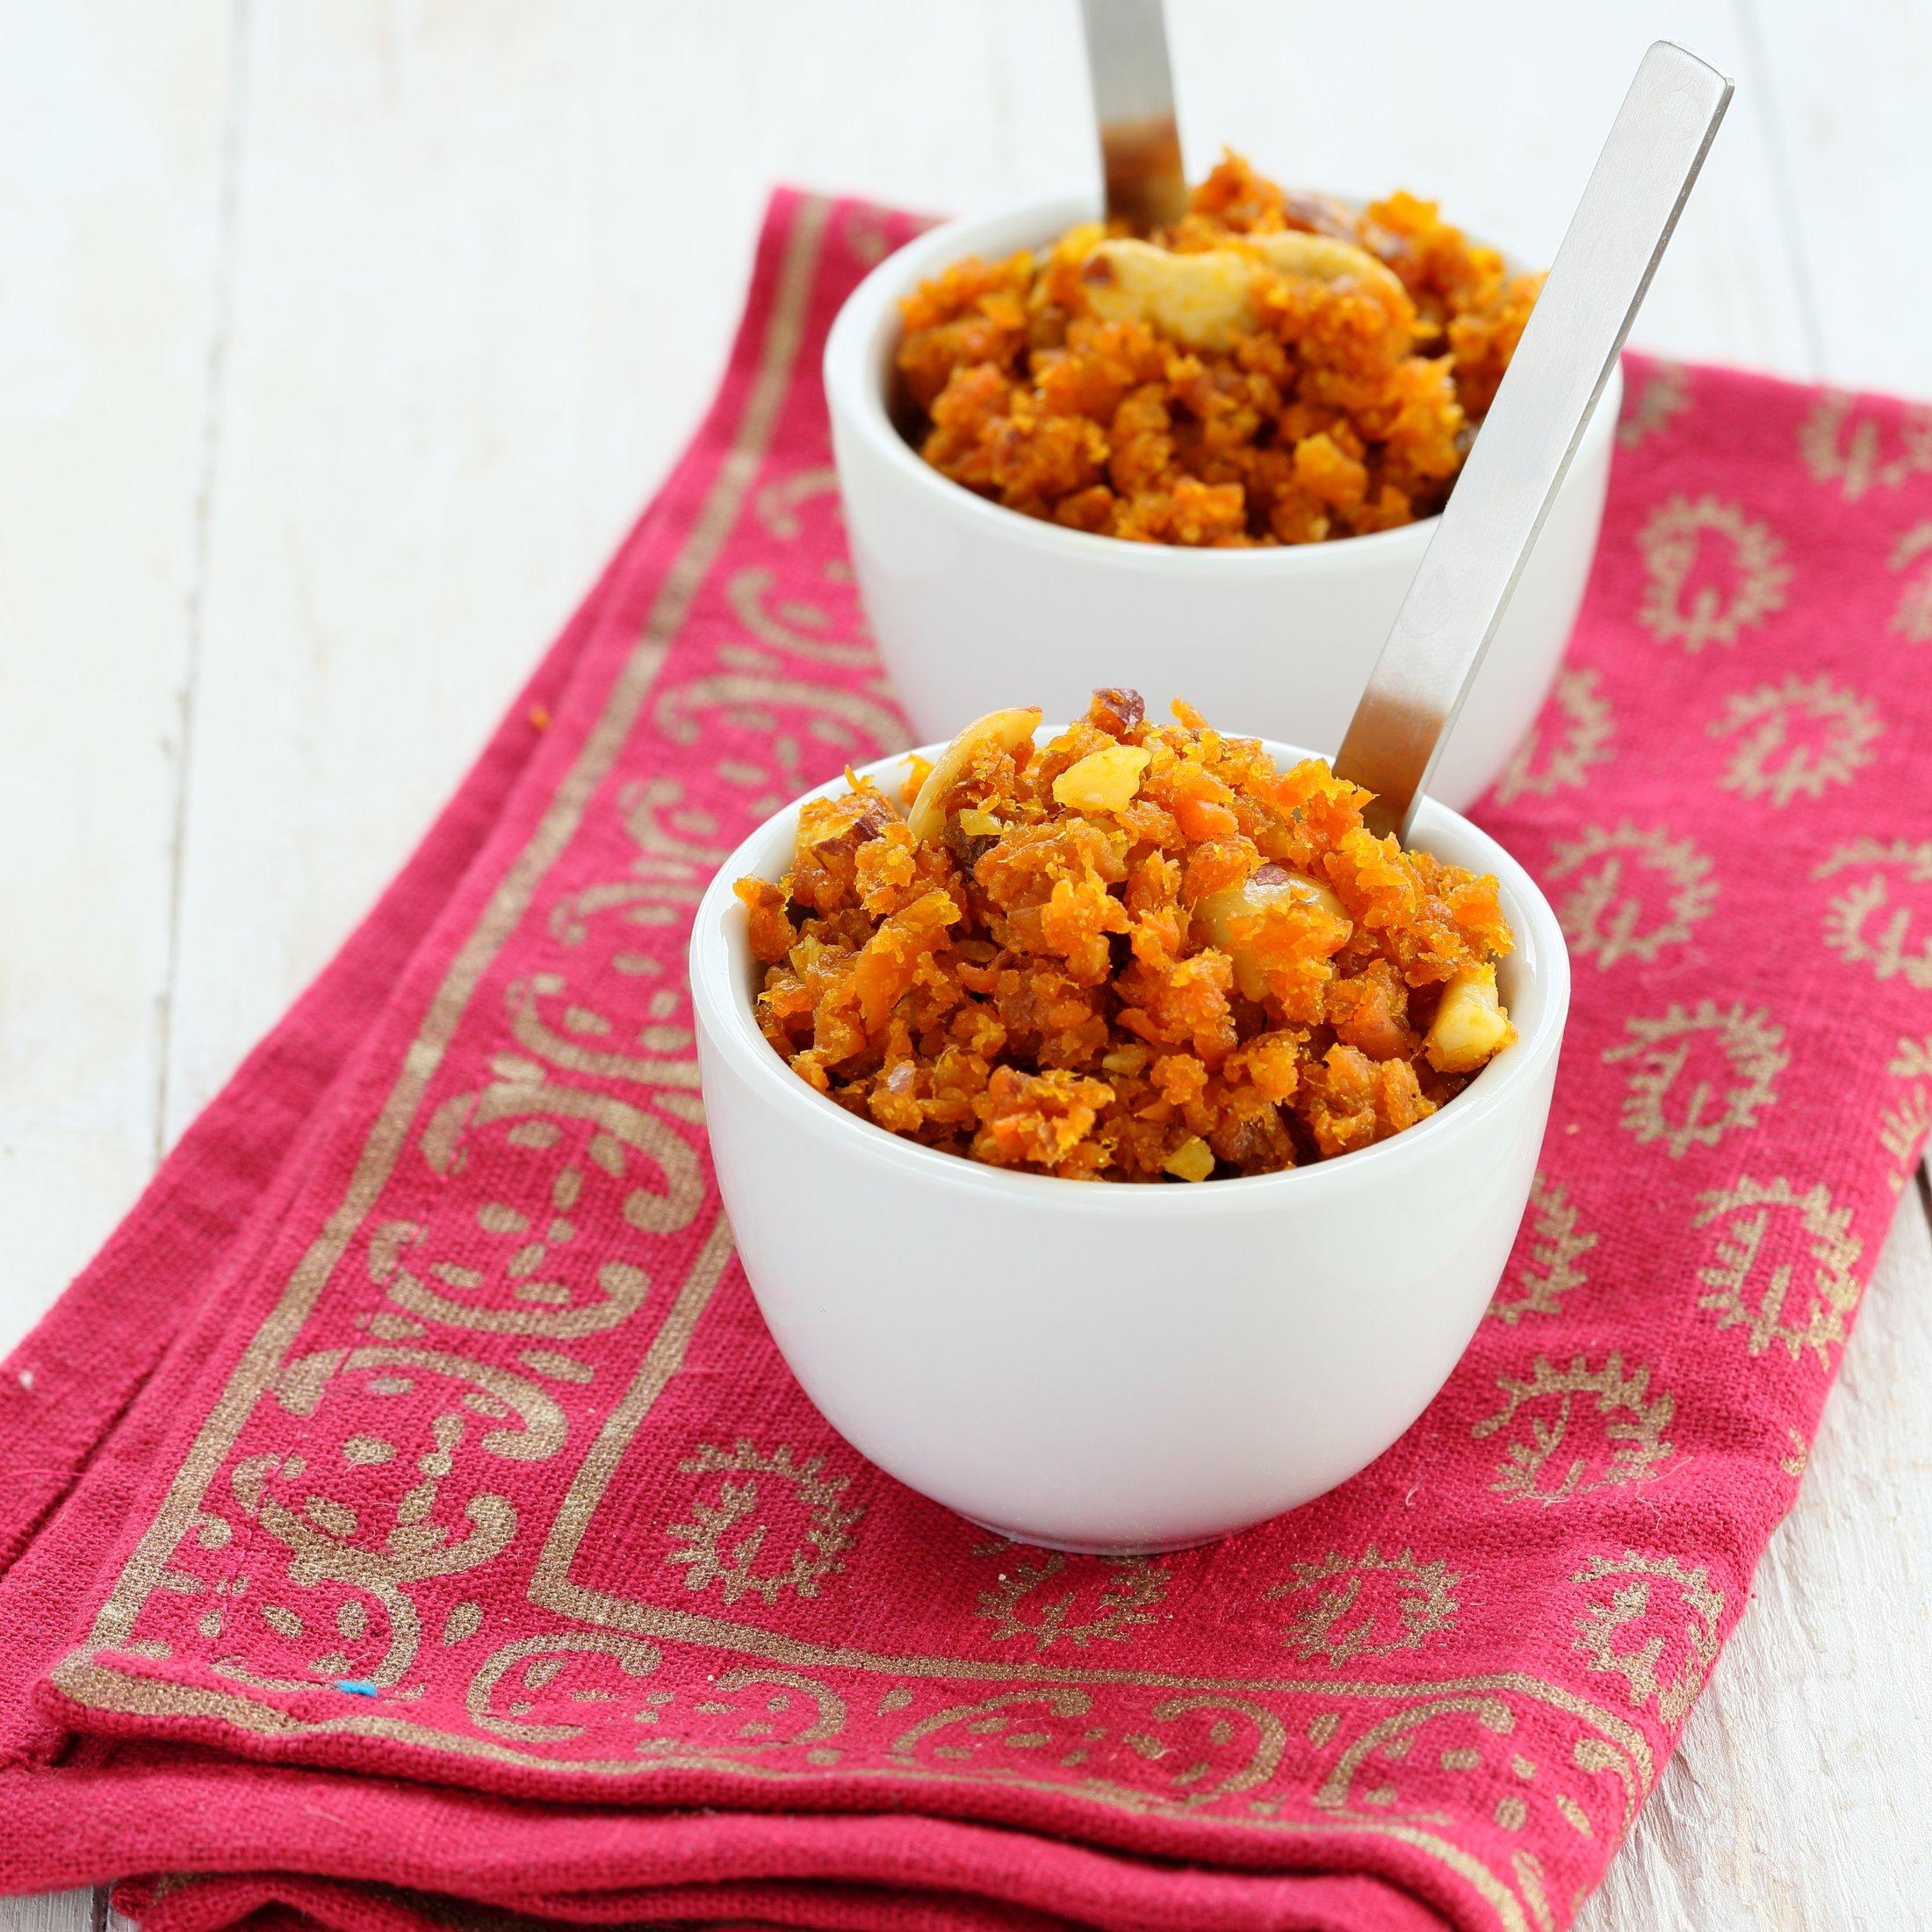 Dessert-Carrot Halwa 9025 - Vegan Richa